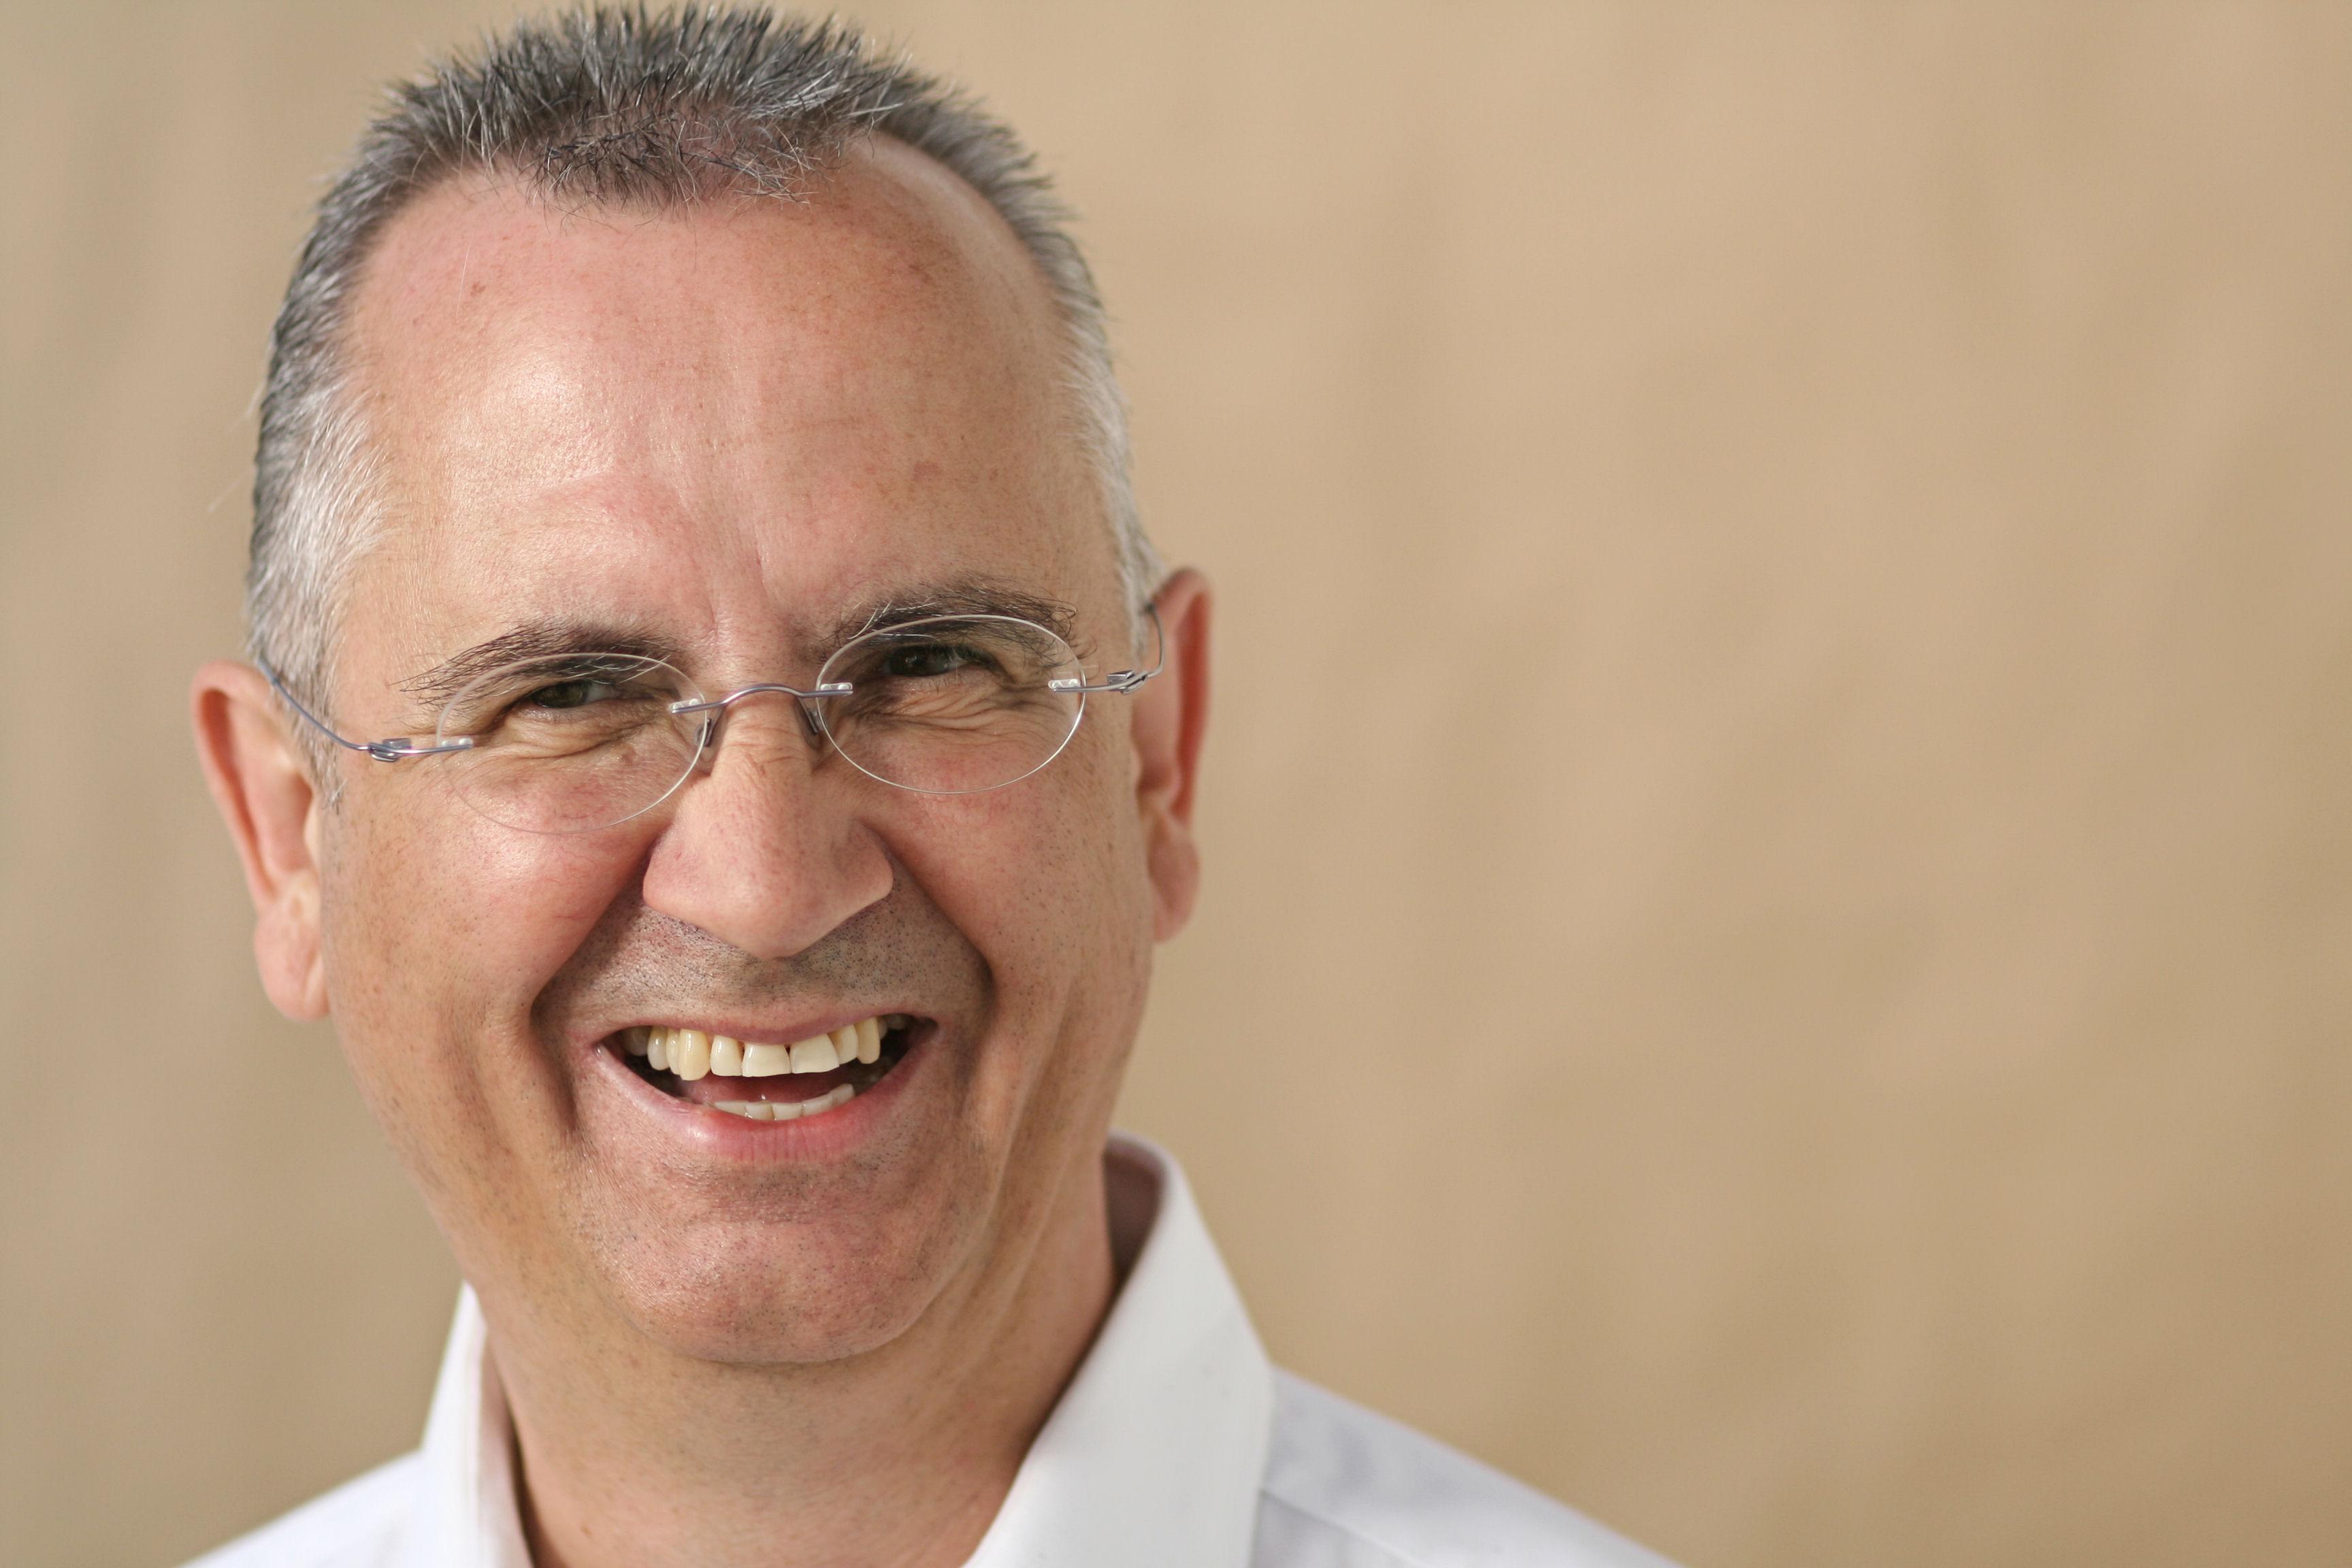 Claus-Peter Schaffhauser, L'État c'est moi